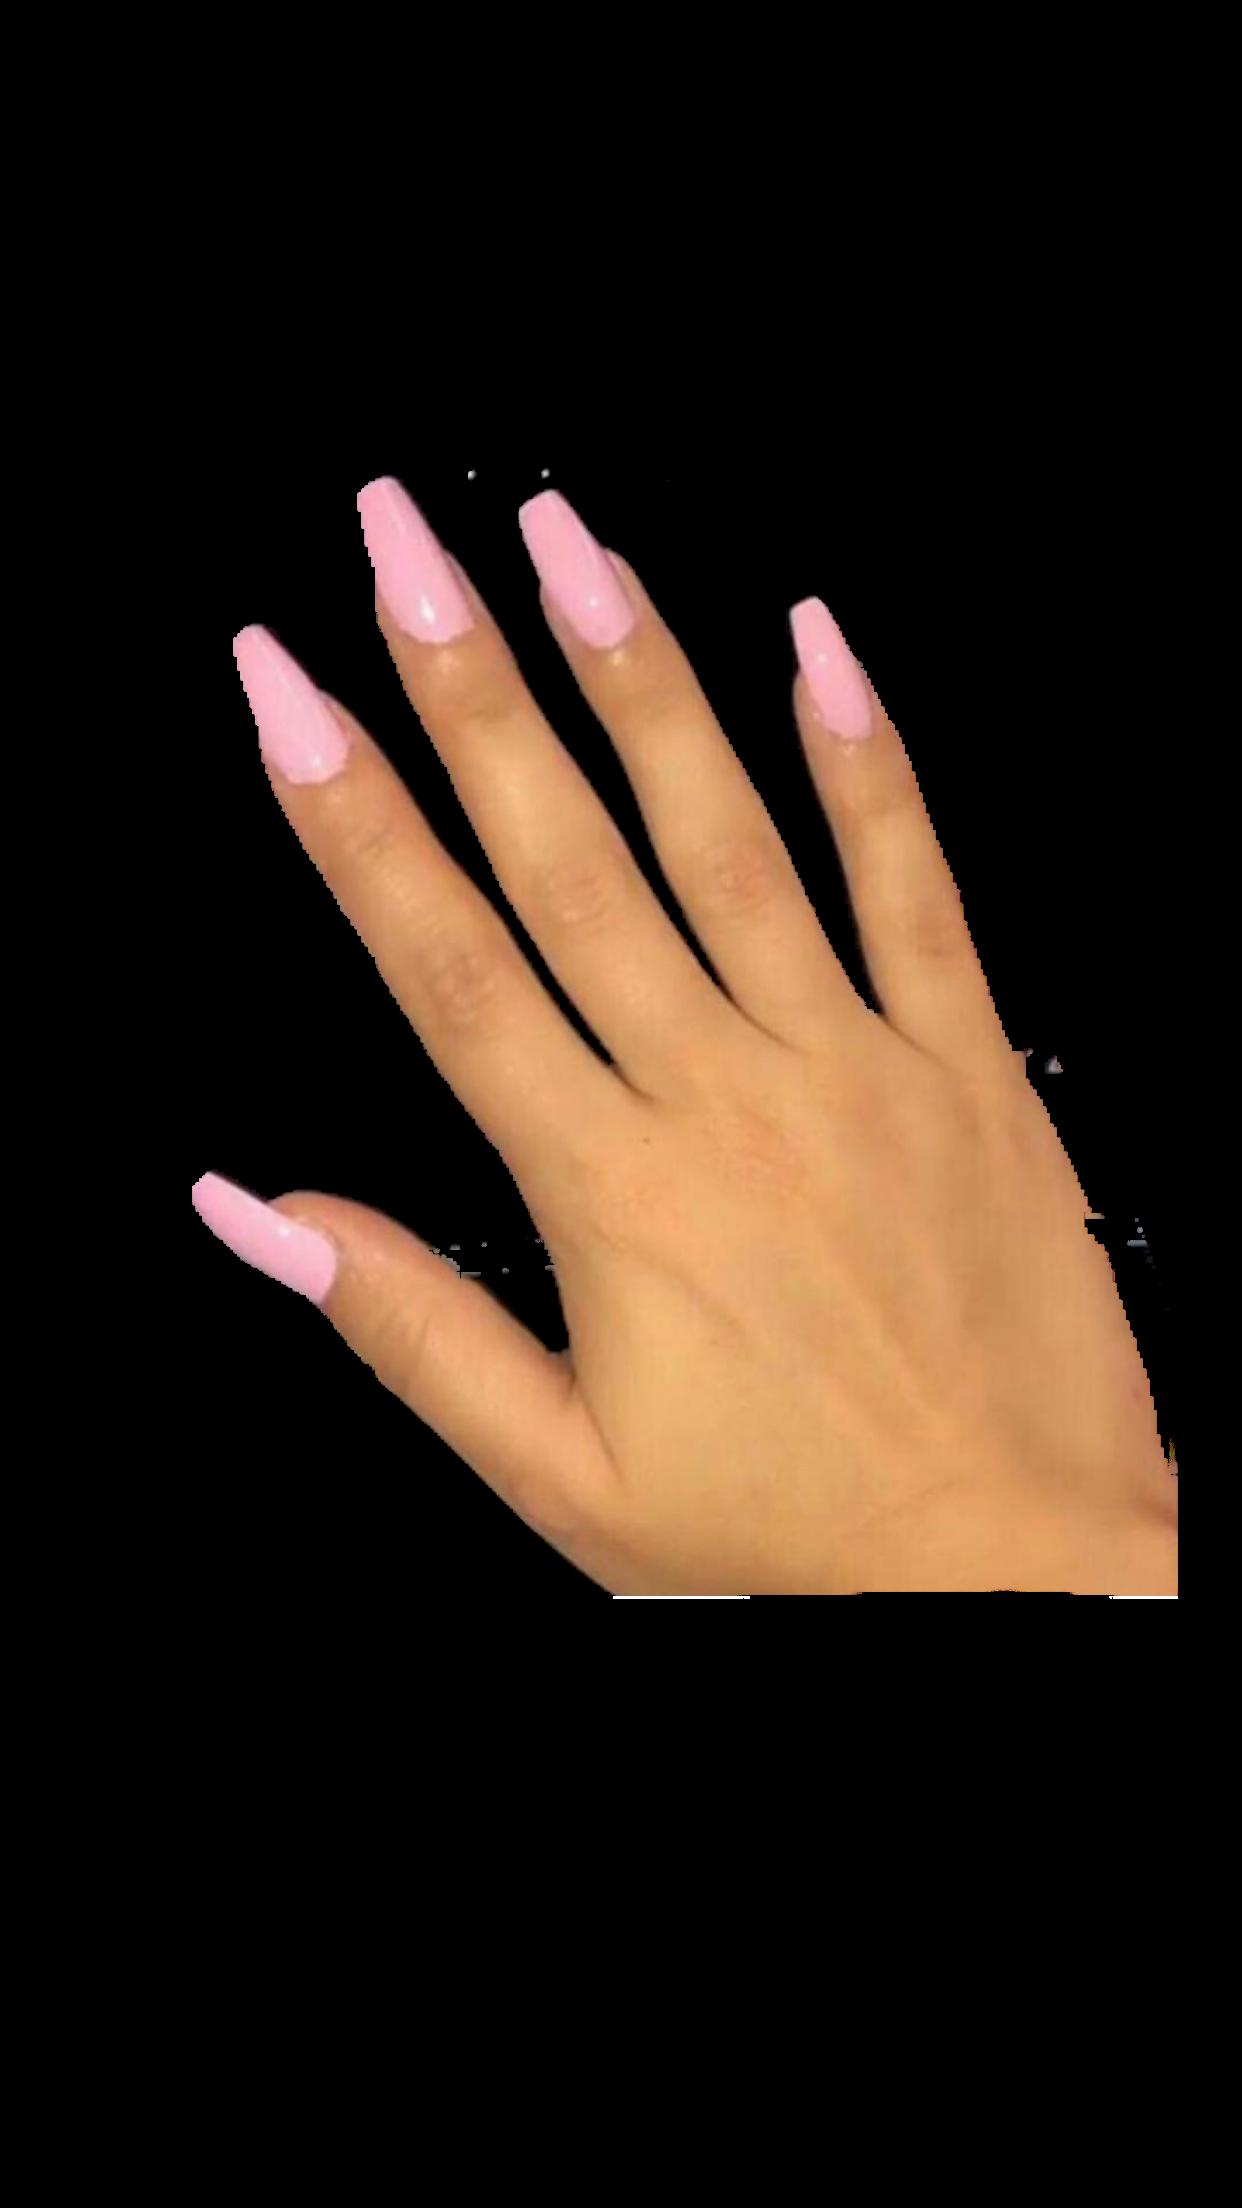 Tan Pink Nails Hand Polyvore Moodboard Filler Image Nails Gel Manicure Nails Acyrlic Nails